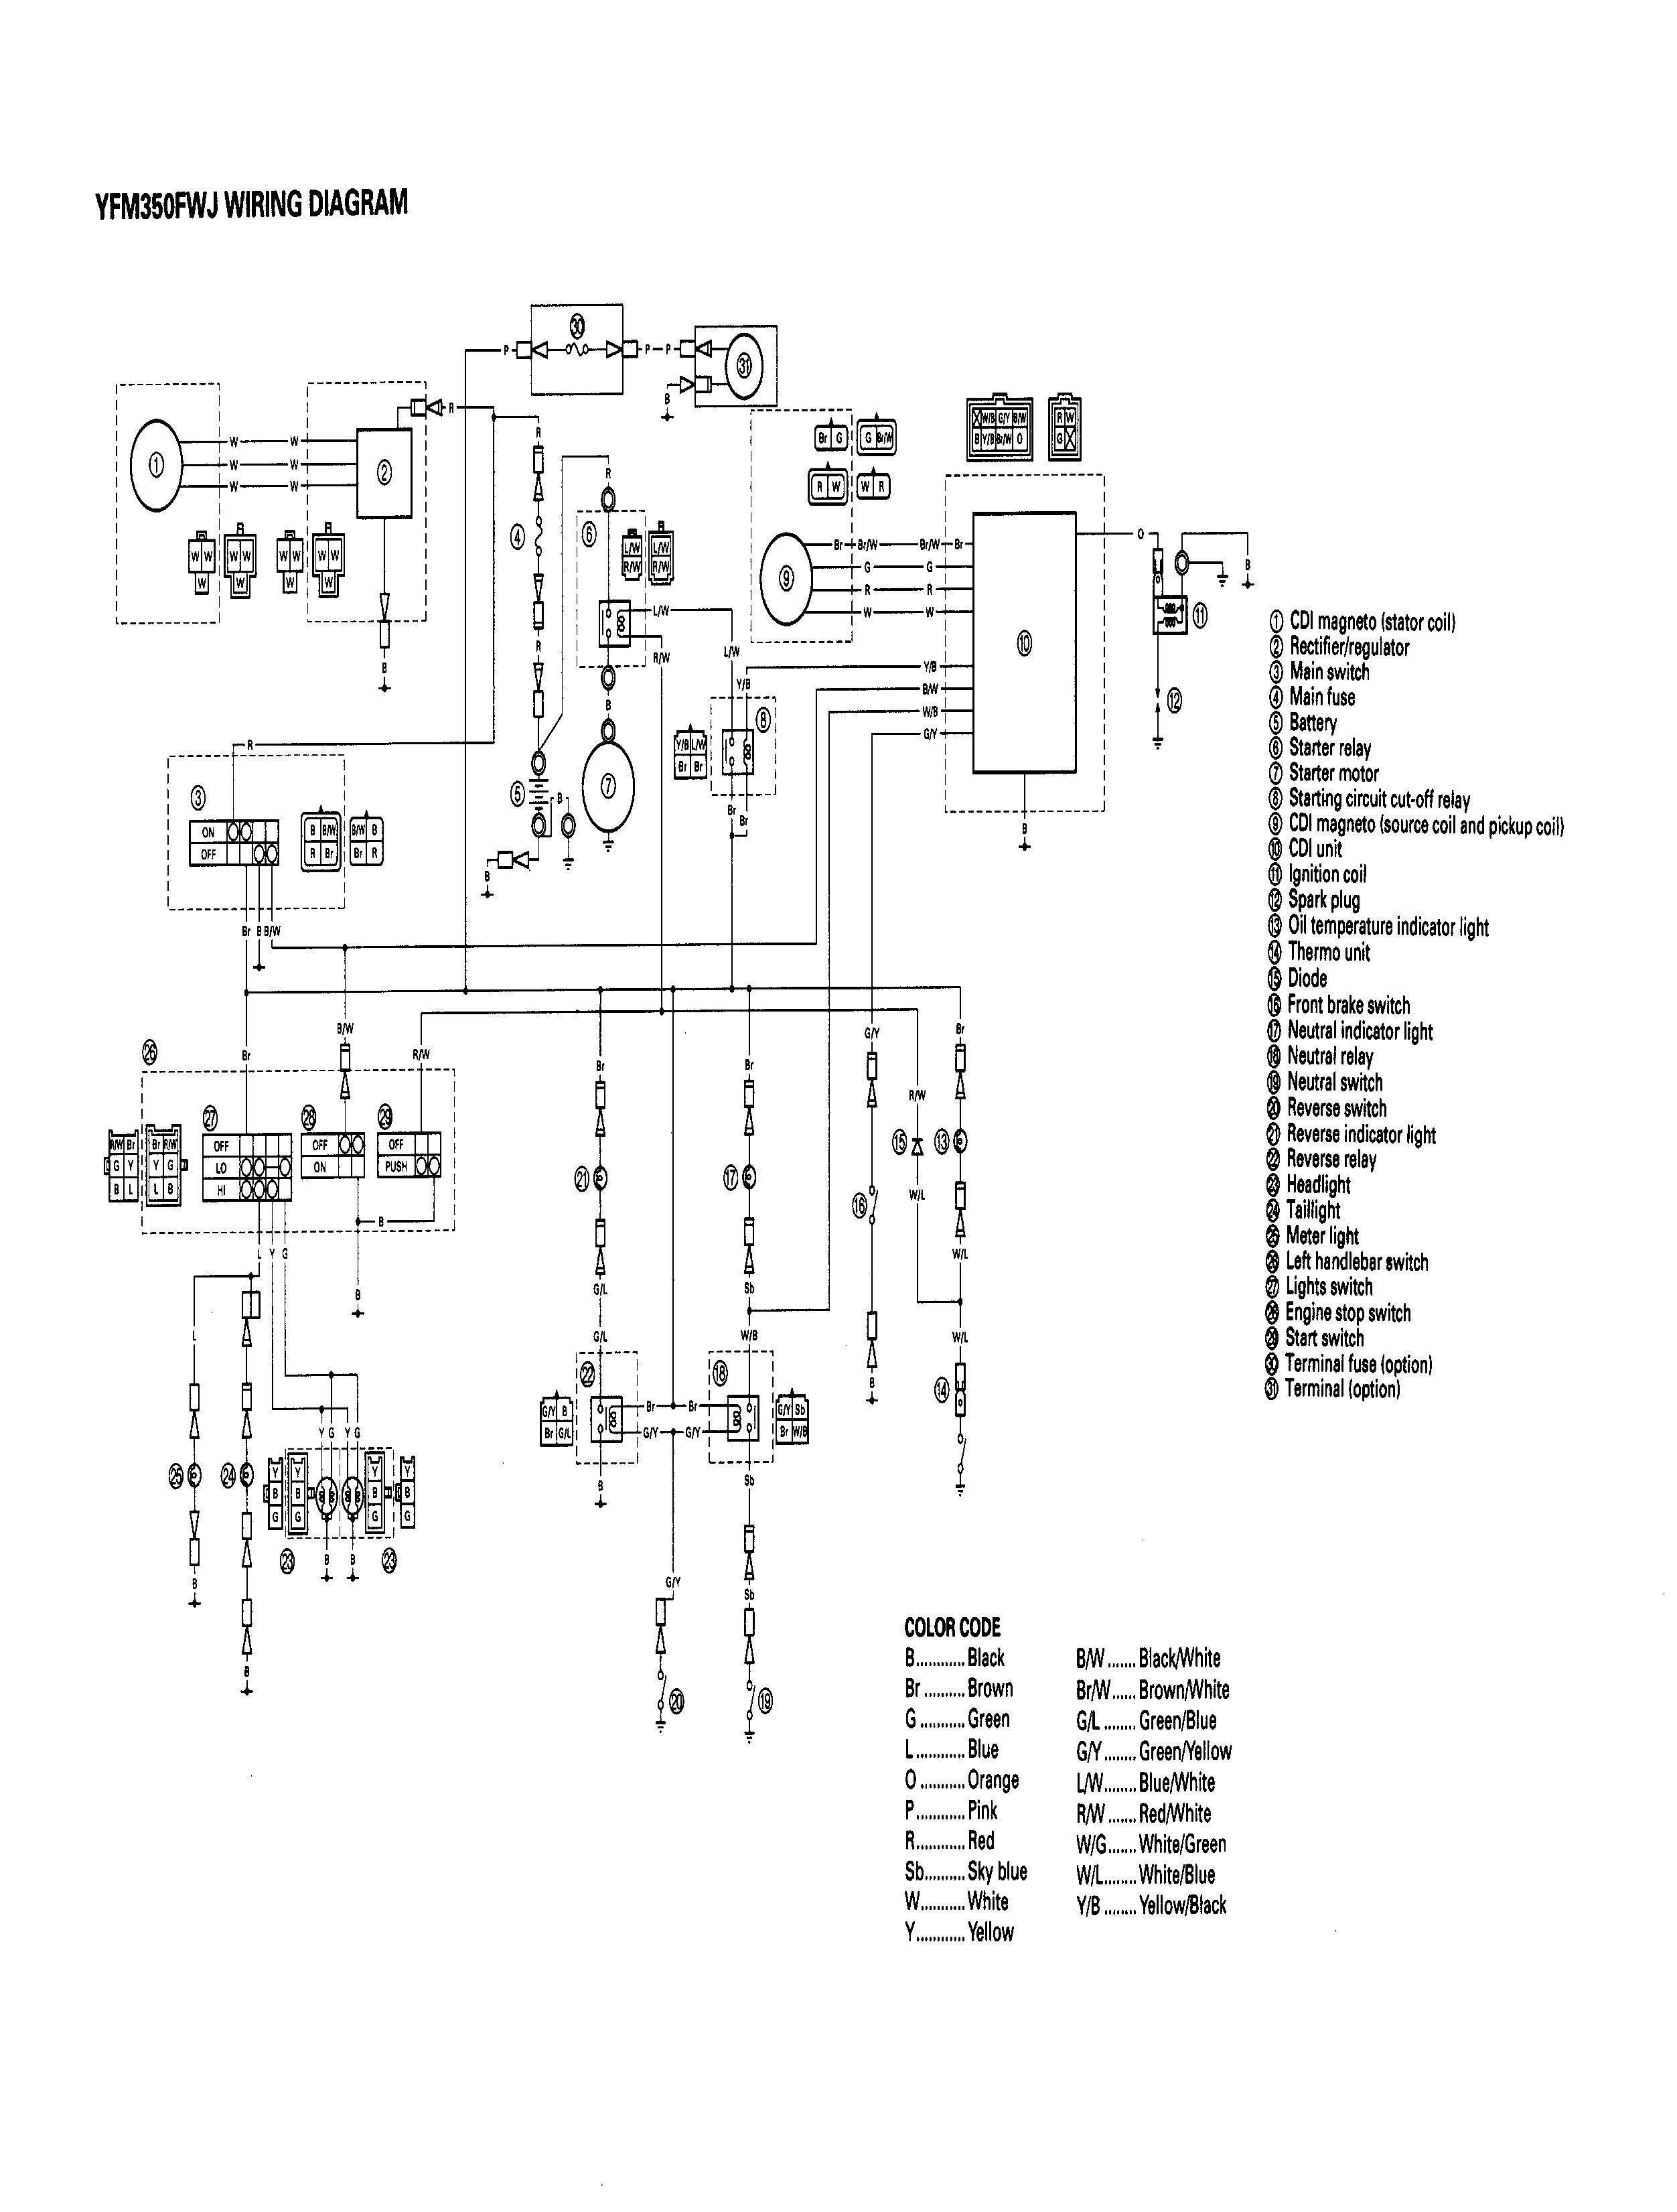 Yamaha Warrior 350 Wiring Specs Wiring Diagram Schematic Yamaha Diagram Big Bear